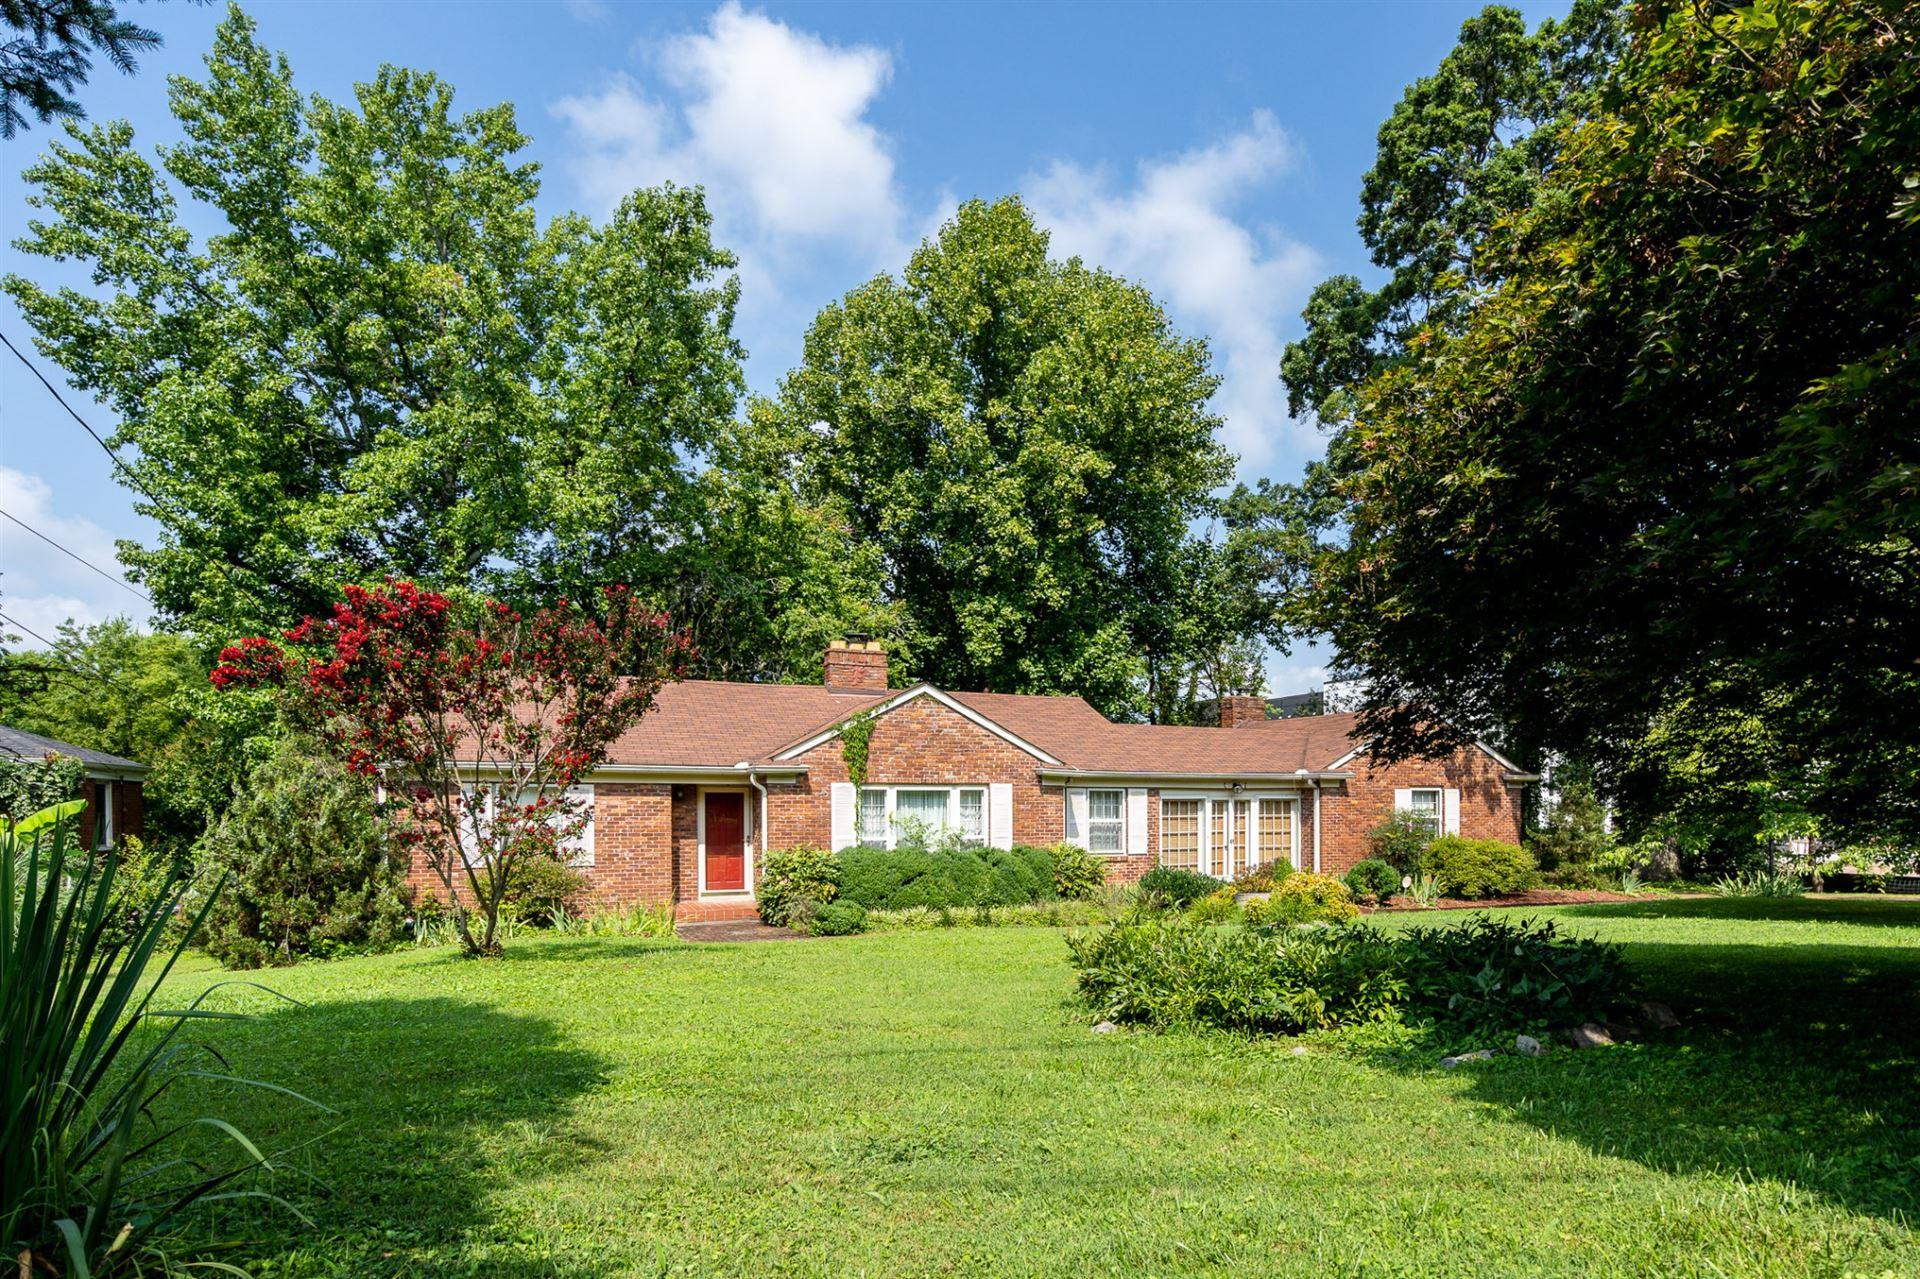 200 Blue Hills Dr, Nashville, TN 37214 - MLS#: 2276754